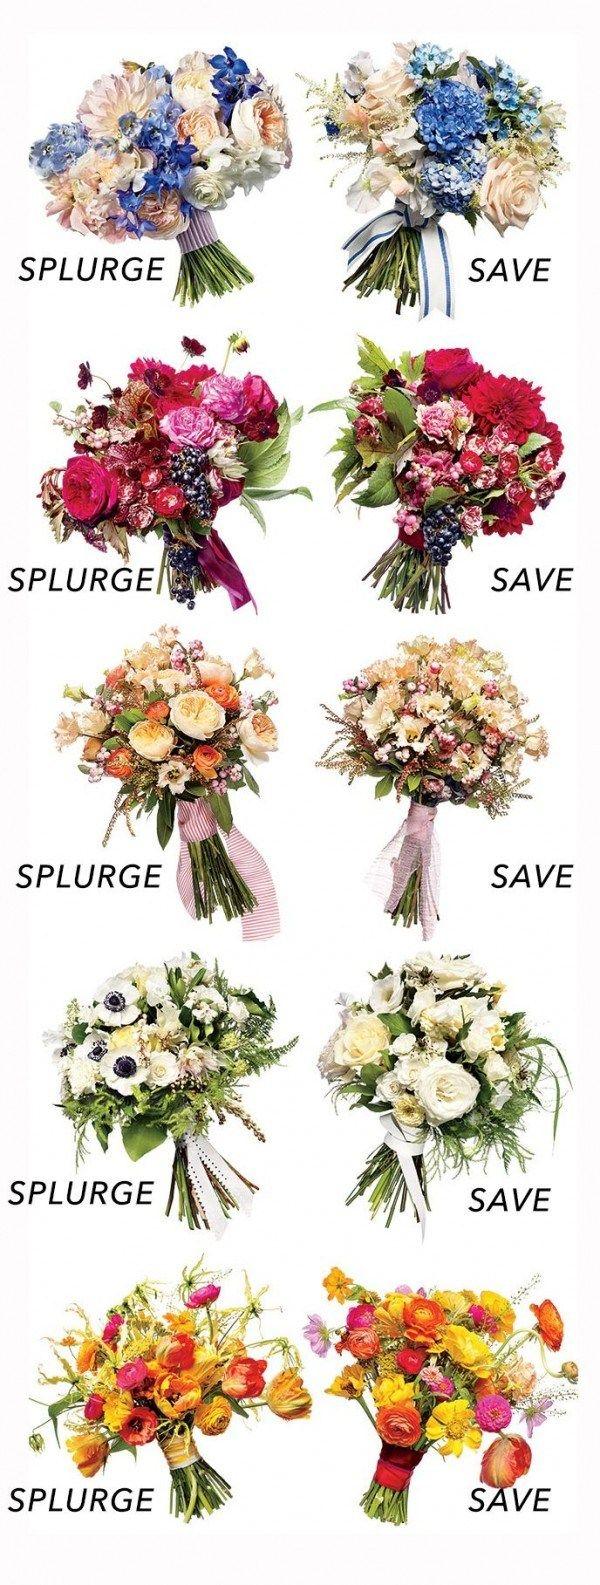 Cheap Flower Alternatives Save Vs Splurge Erins Wedding